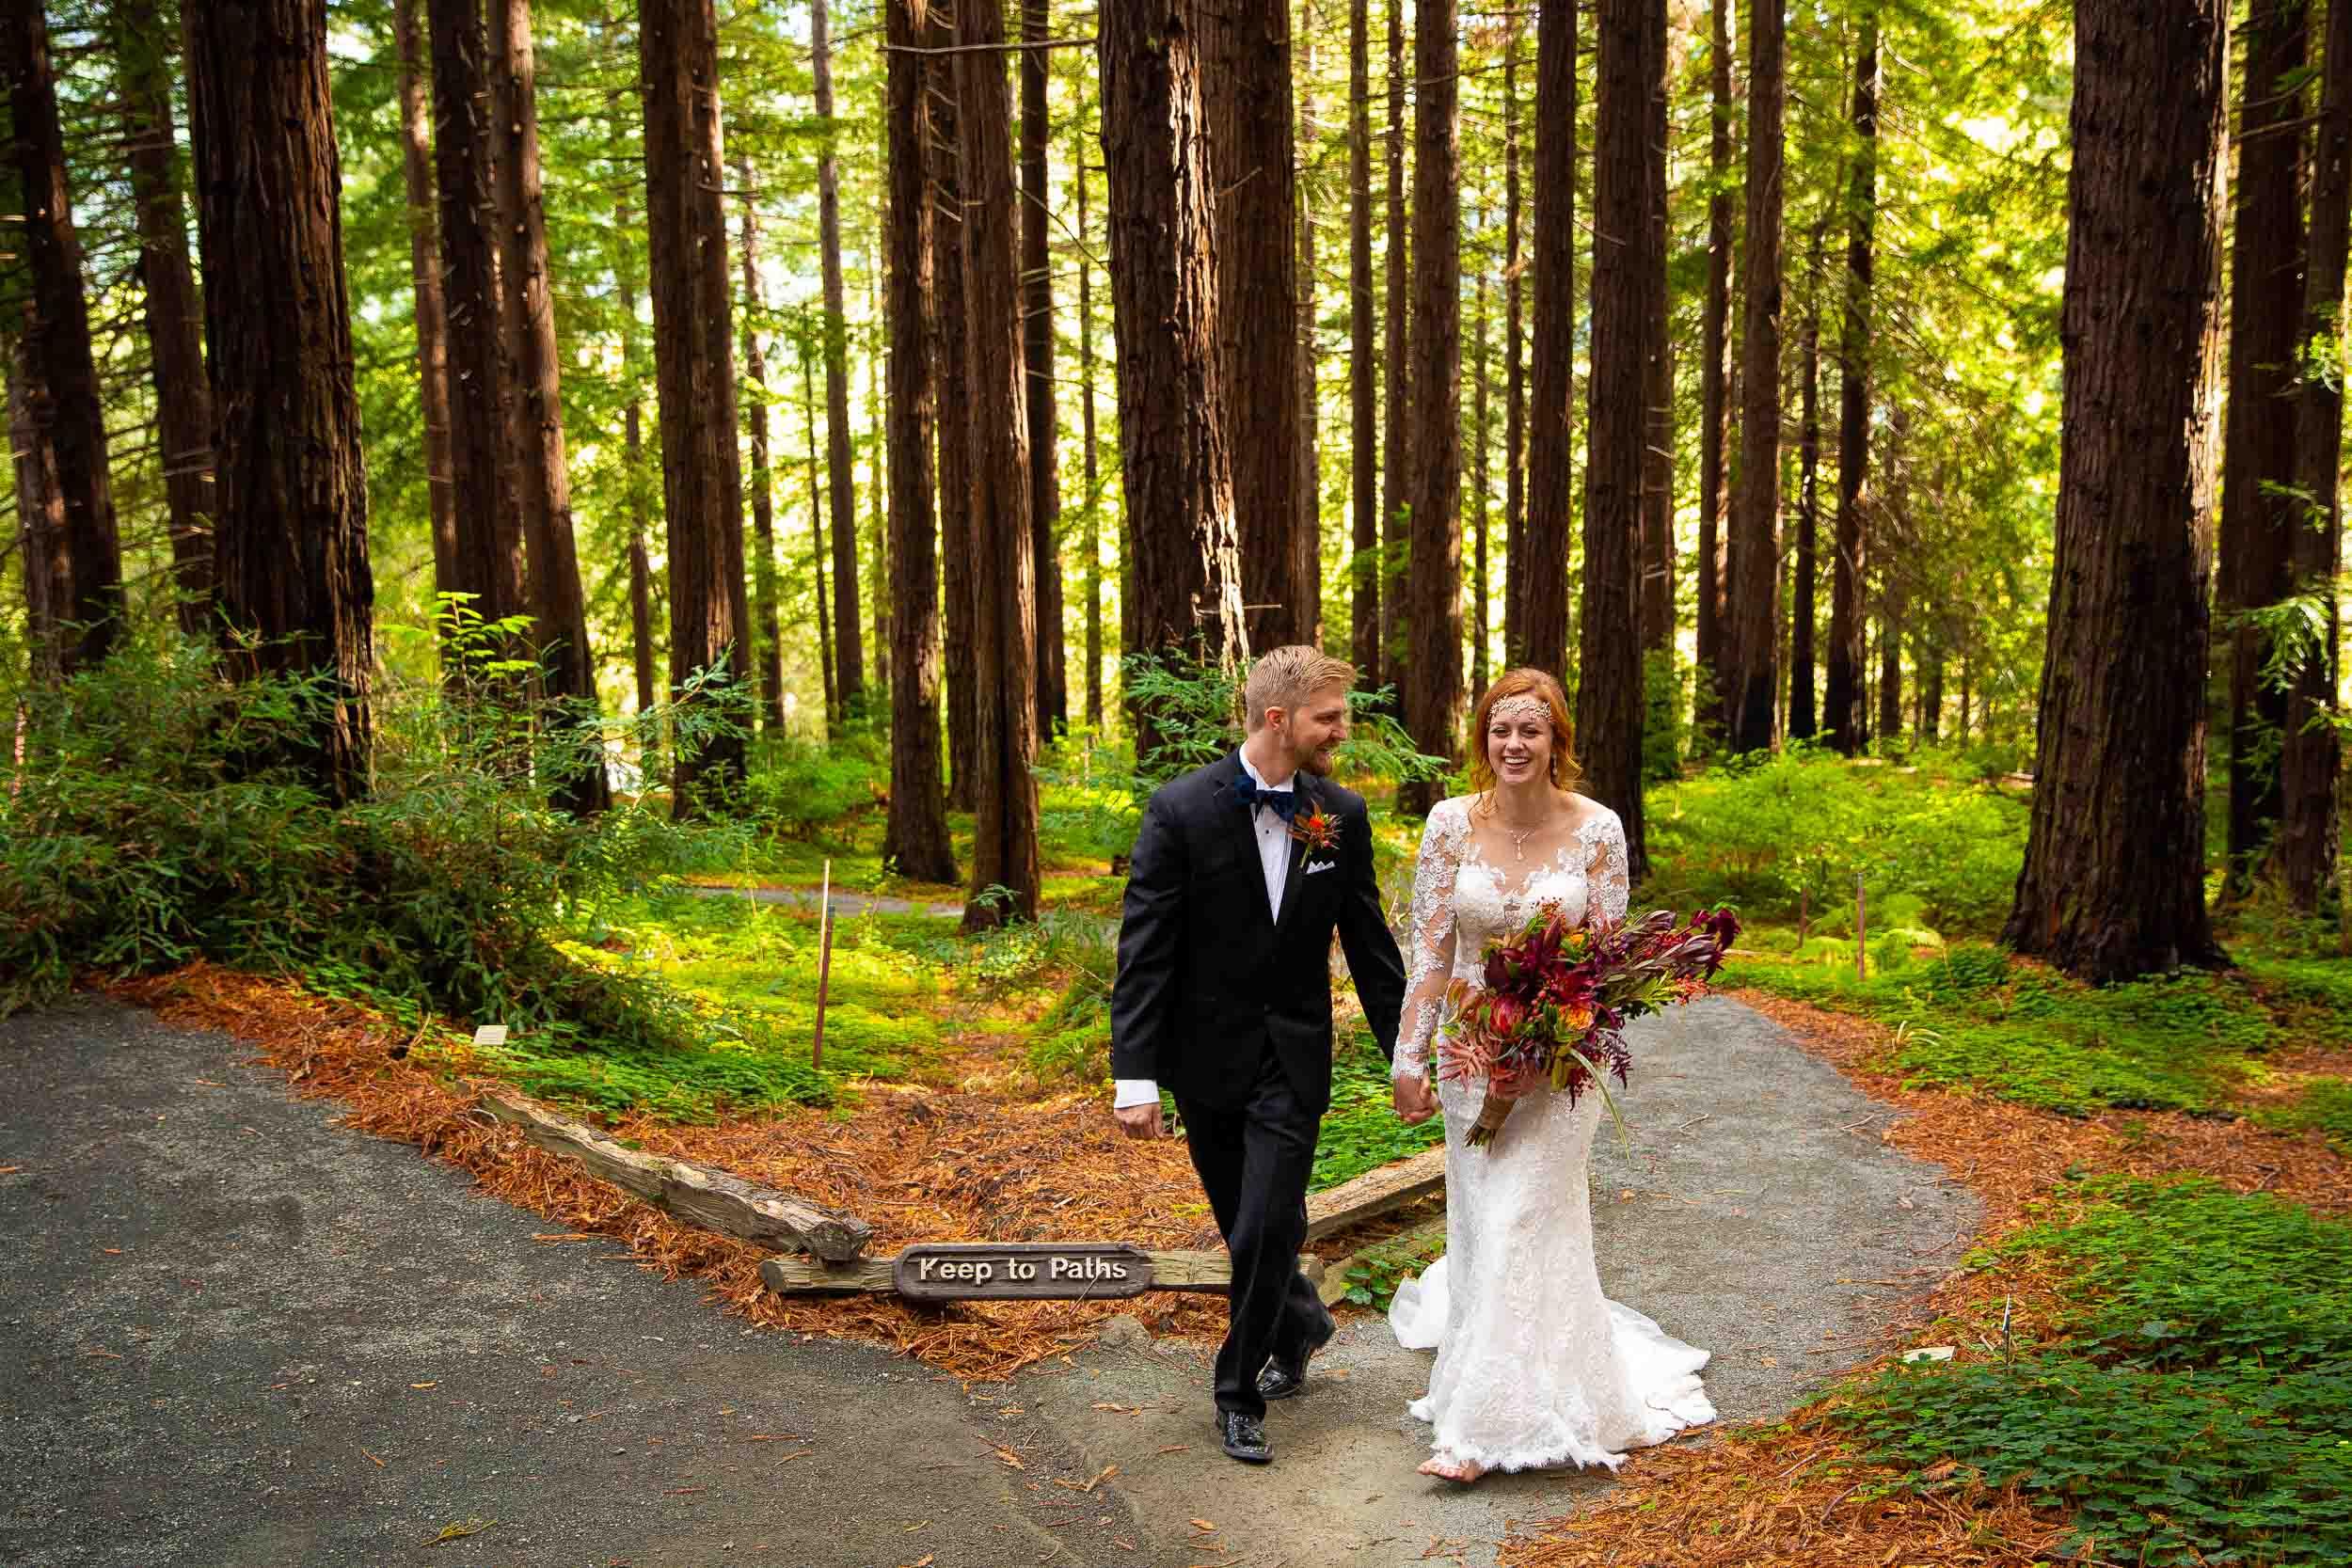 Berkeley Botanical Garden Wedding Ceremony in the Redwood Grove Ceremony and SF Bay Wedding Cruise Reception-53.jpg